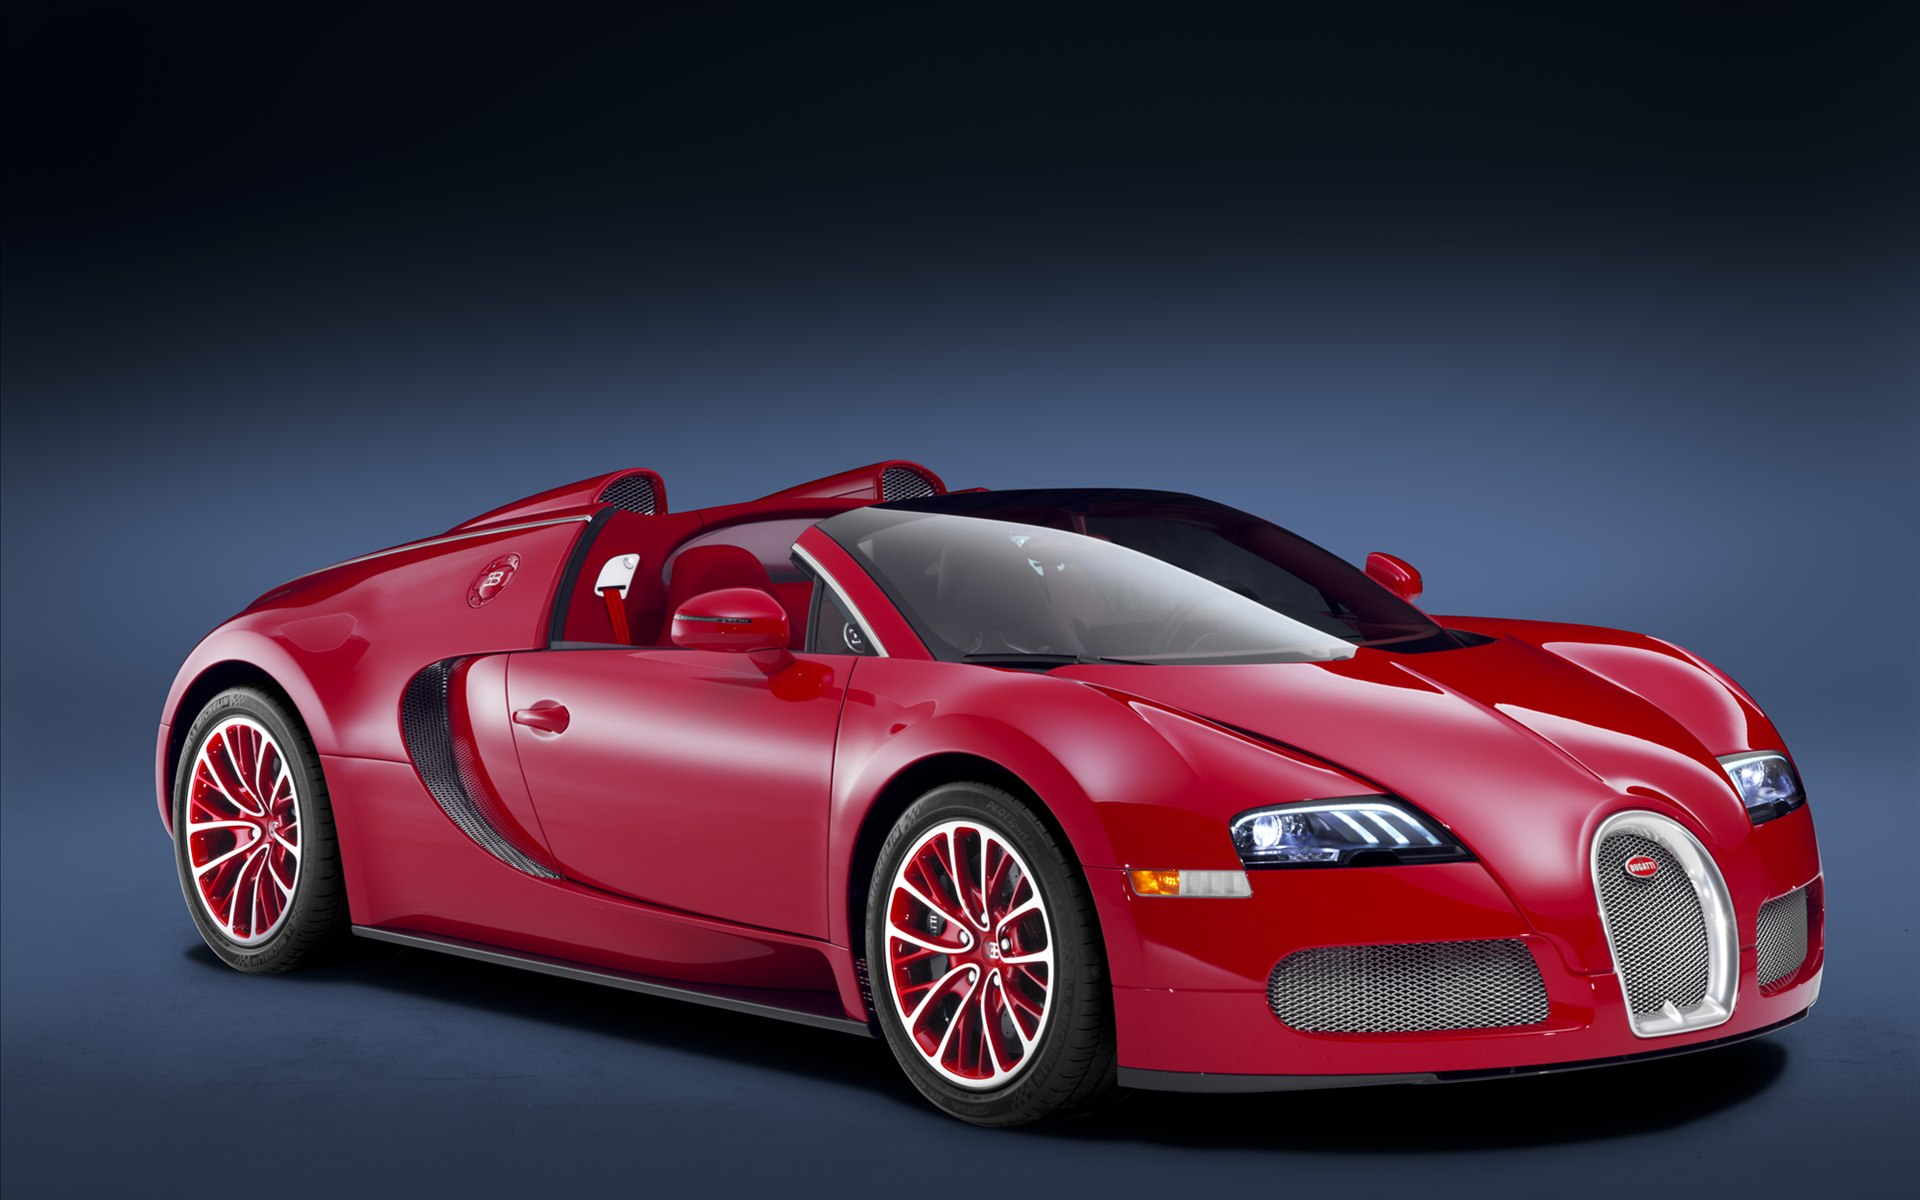 Bugatti-Veyron-Grand-Sport-LOr-Blanc-2011-020 Exciting Bugatti Veyron New Model 2015 Cars Trend